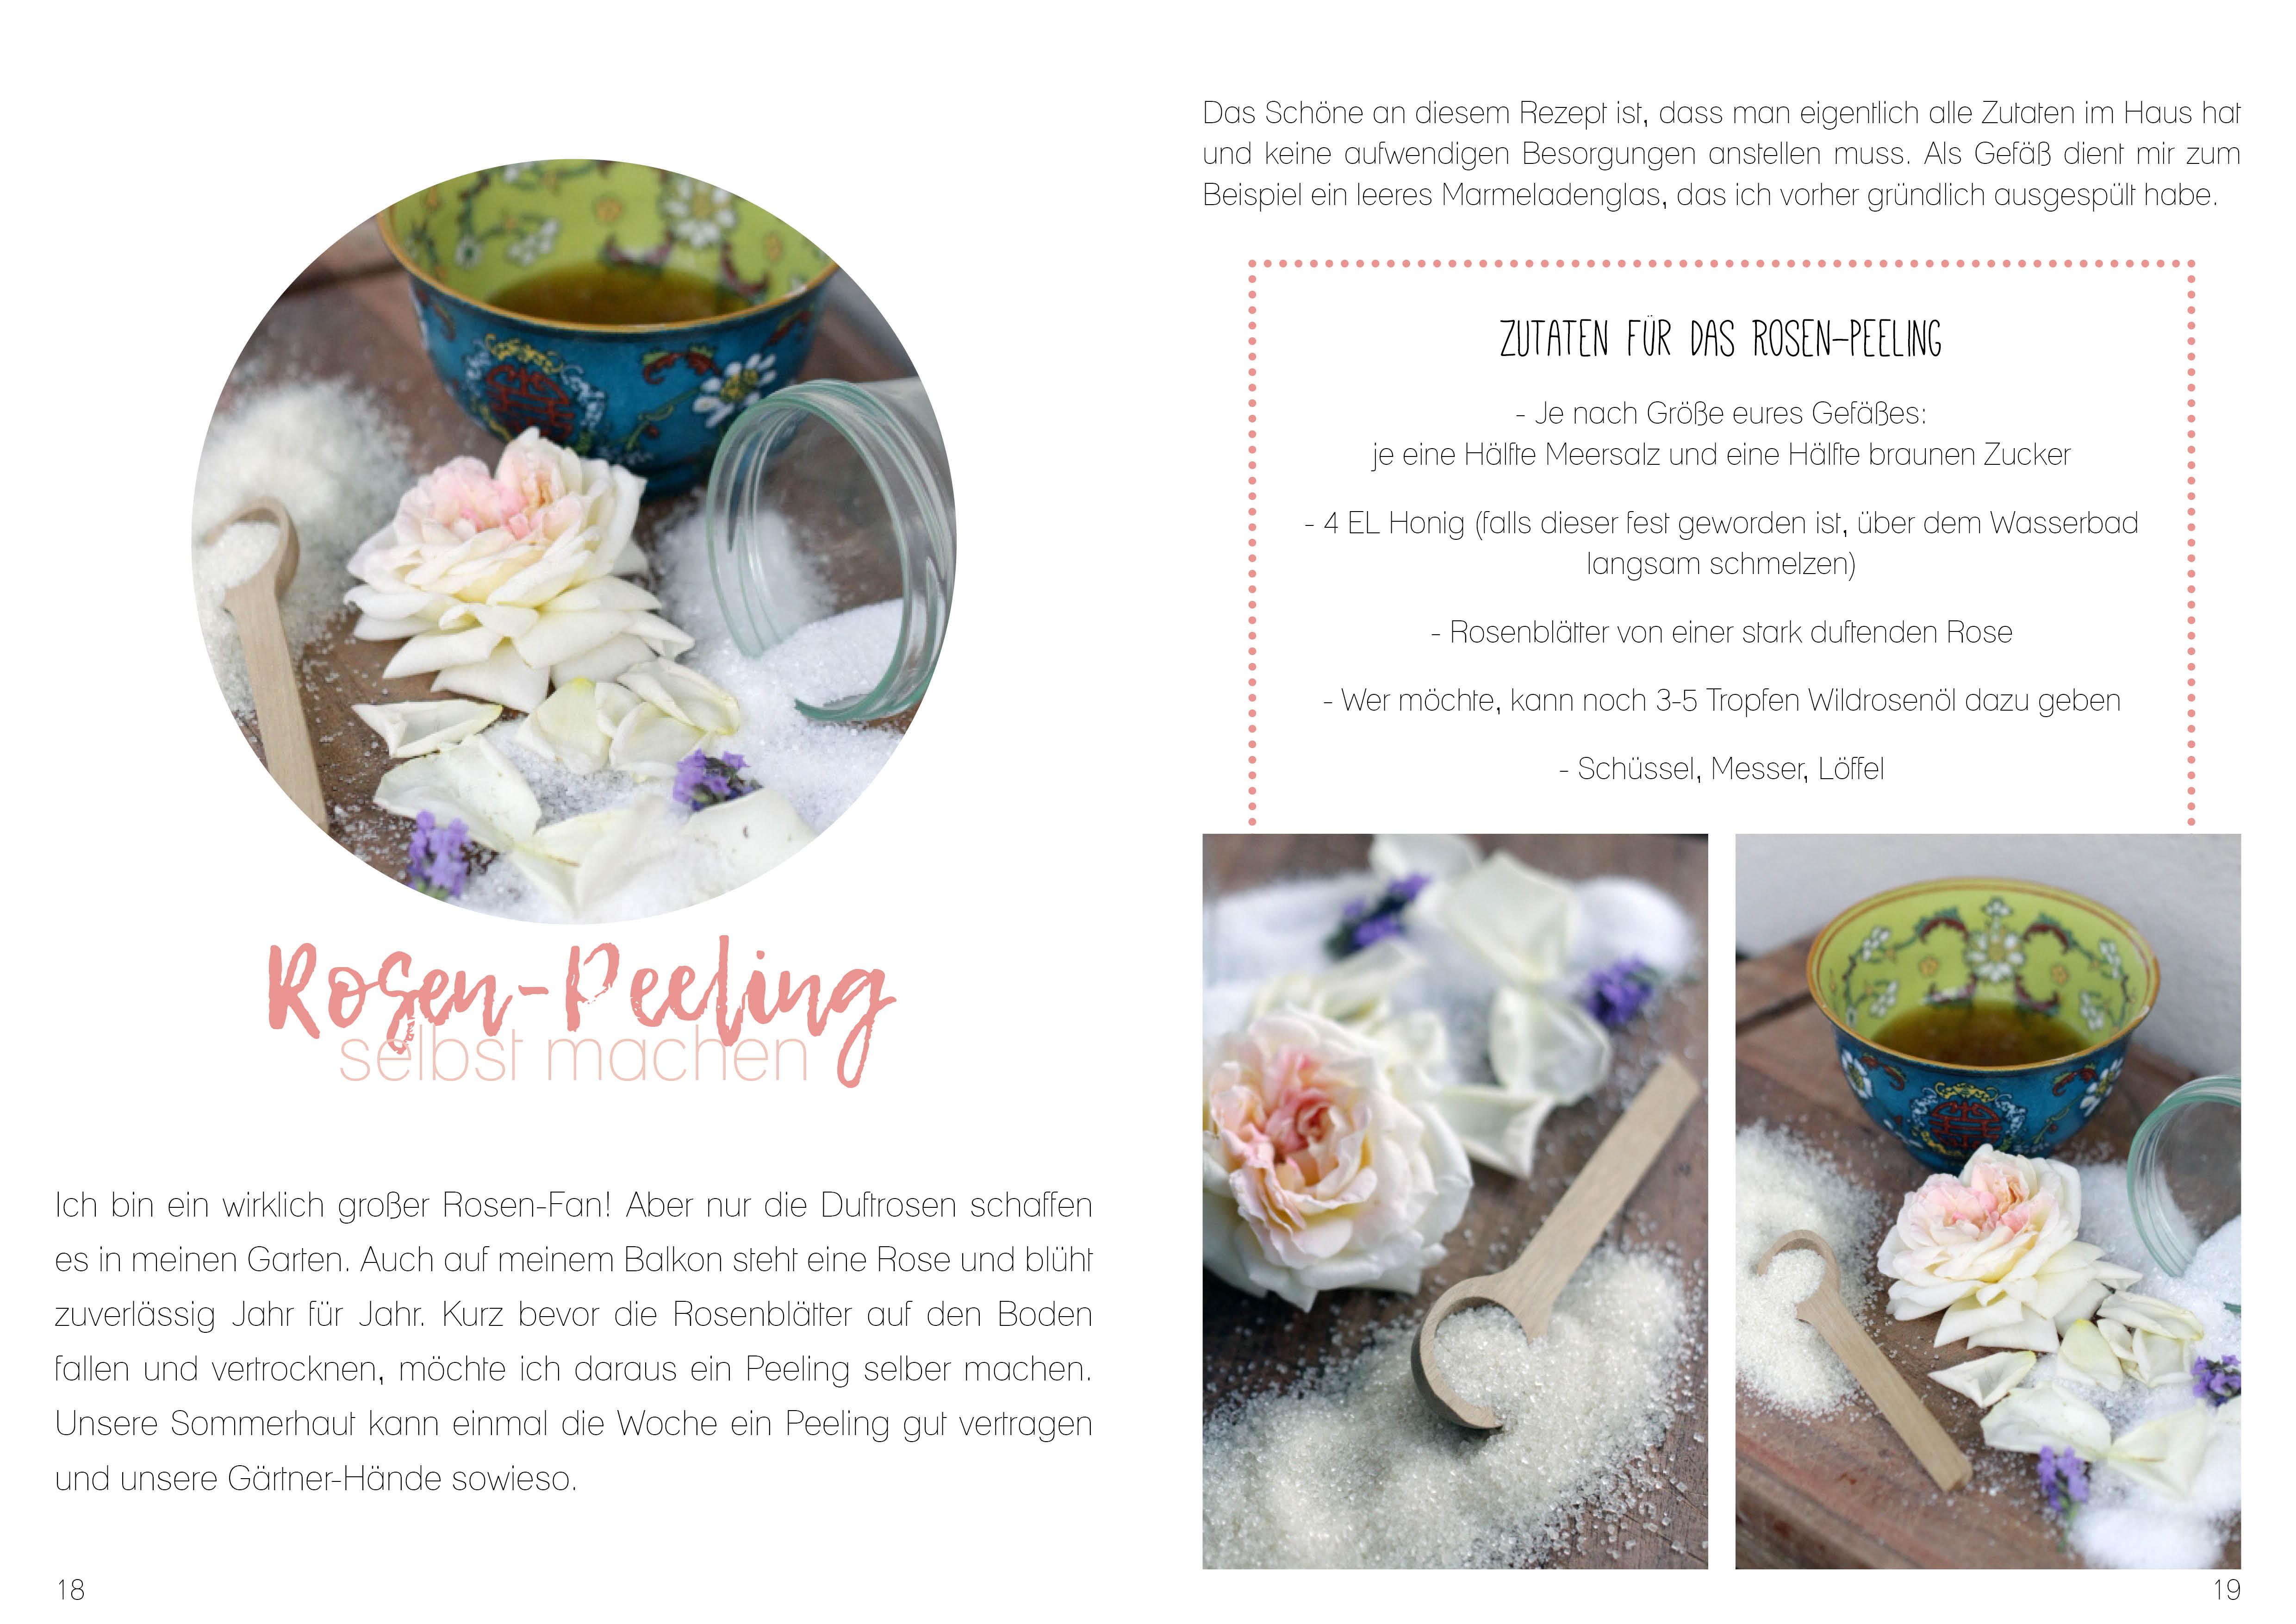 Vorschau Rosen-Peeling